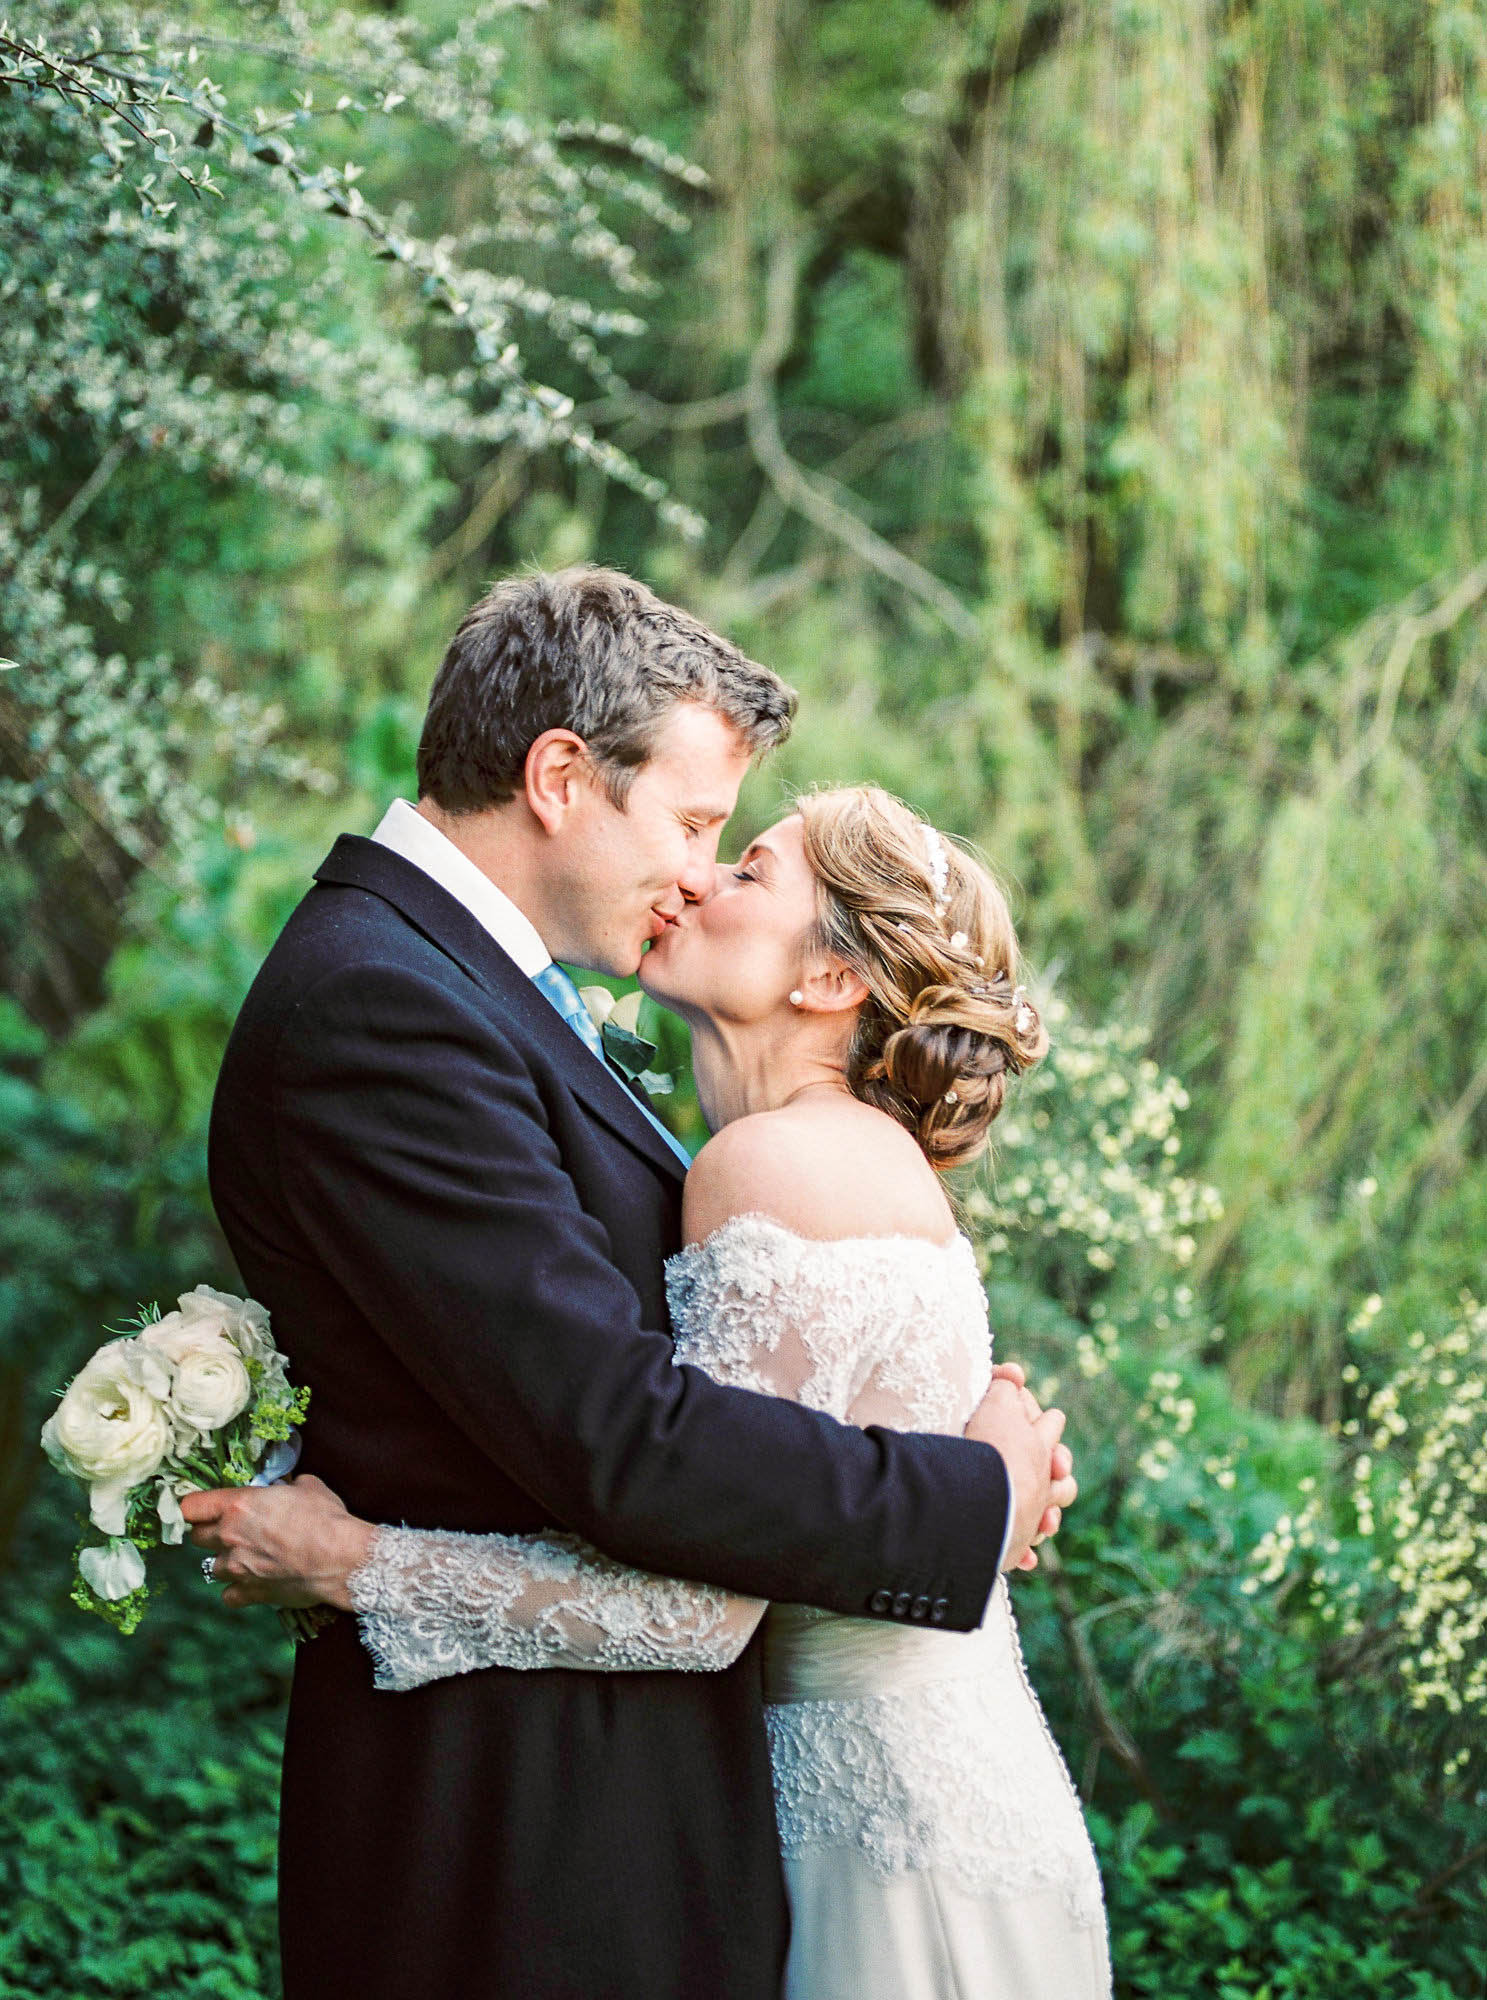 Amy O'Boyle Photography- Destination & UK Fine Art Film Wedding Photographer- English Countryside Wedding-7.jpg